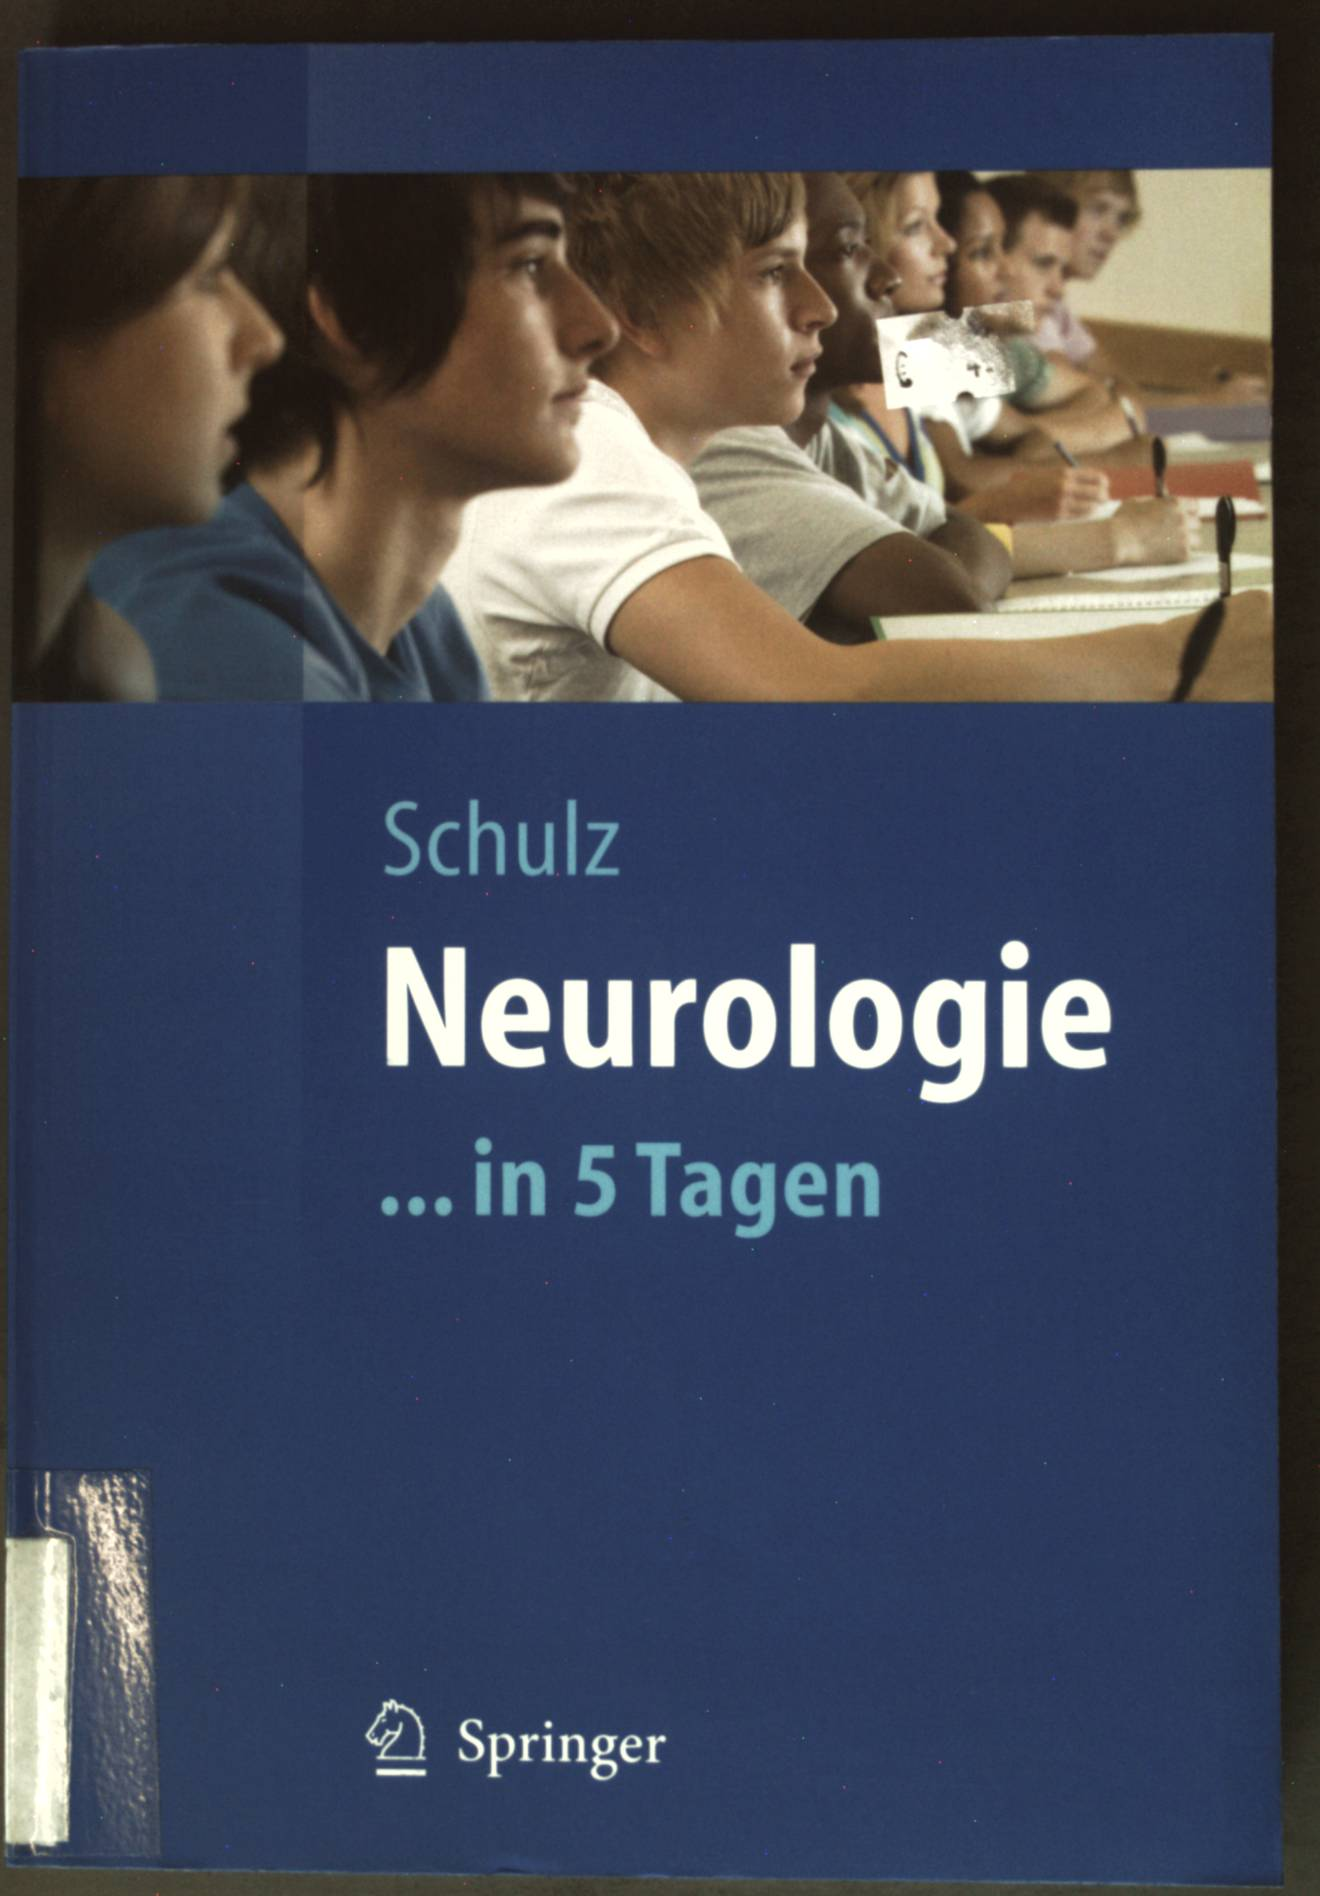 Neurologie...in 5 Tagen; Springer-Lehrbuch - Schulz, Jörg B.